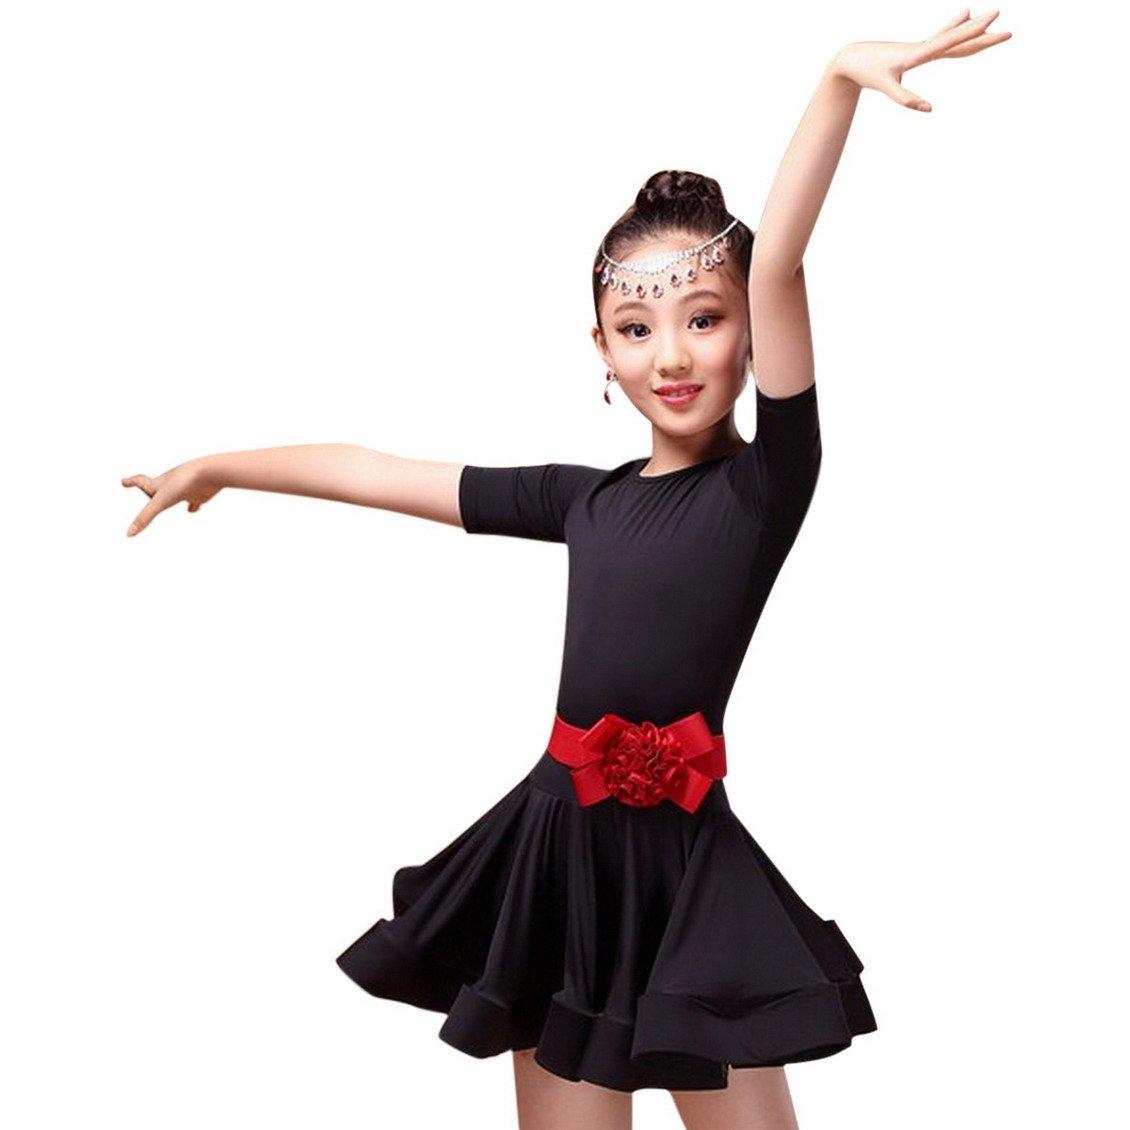 db822eb8a Baby Girls Seamless Cute Latin Dress Skirt Rumba Samba Dancewear Dance  Class Clothes for 4-5Y Black